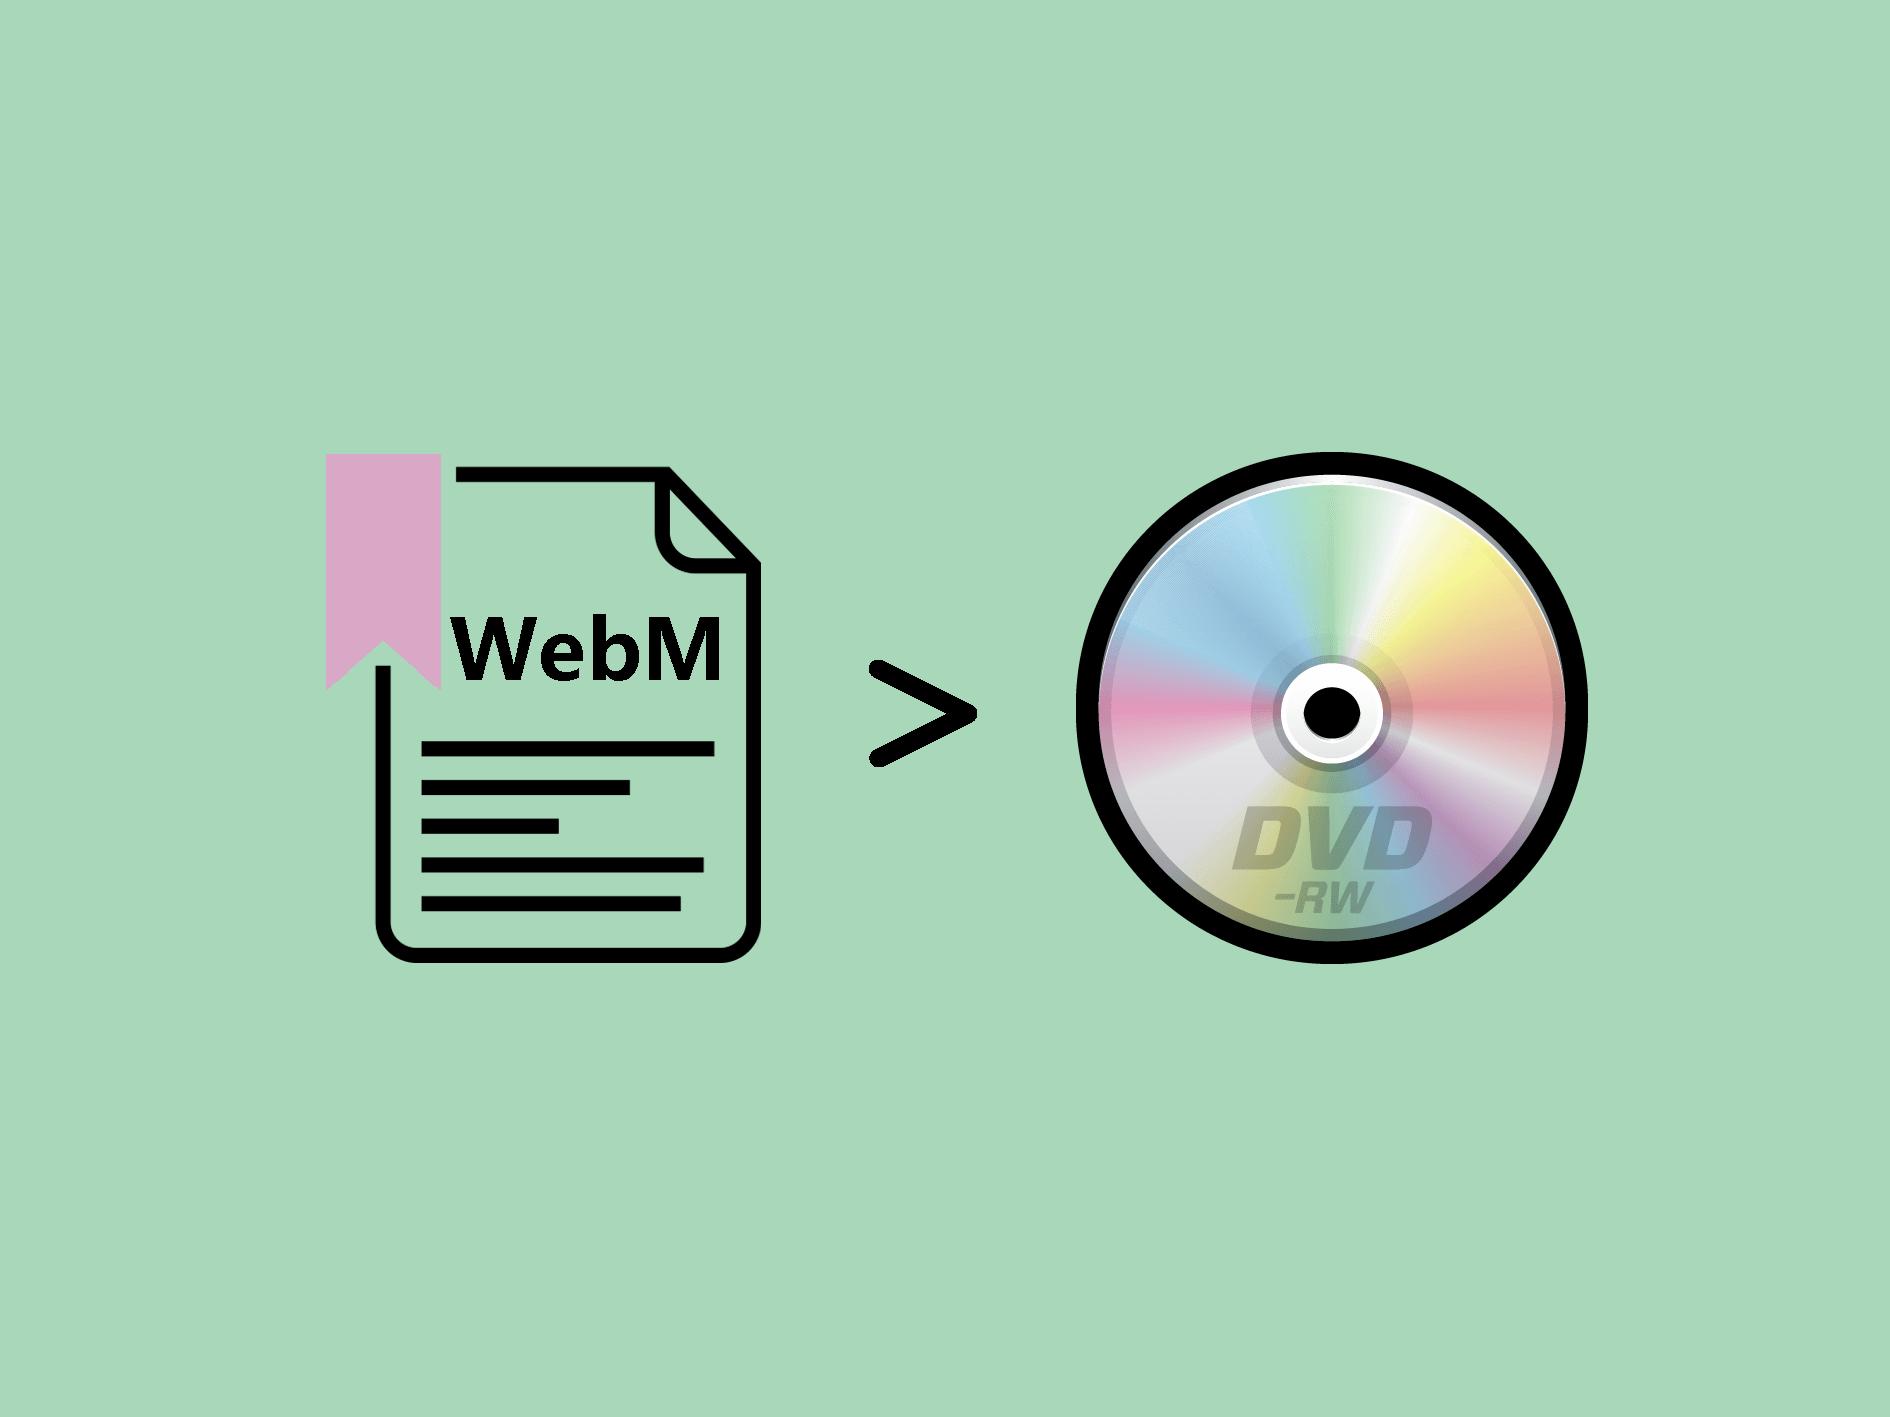 WebMファイルをDVDに書き込む方法